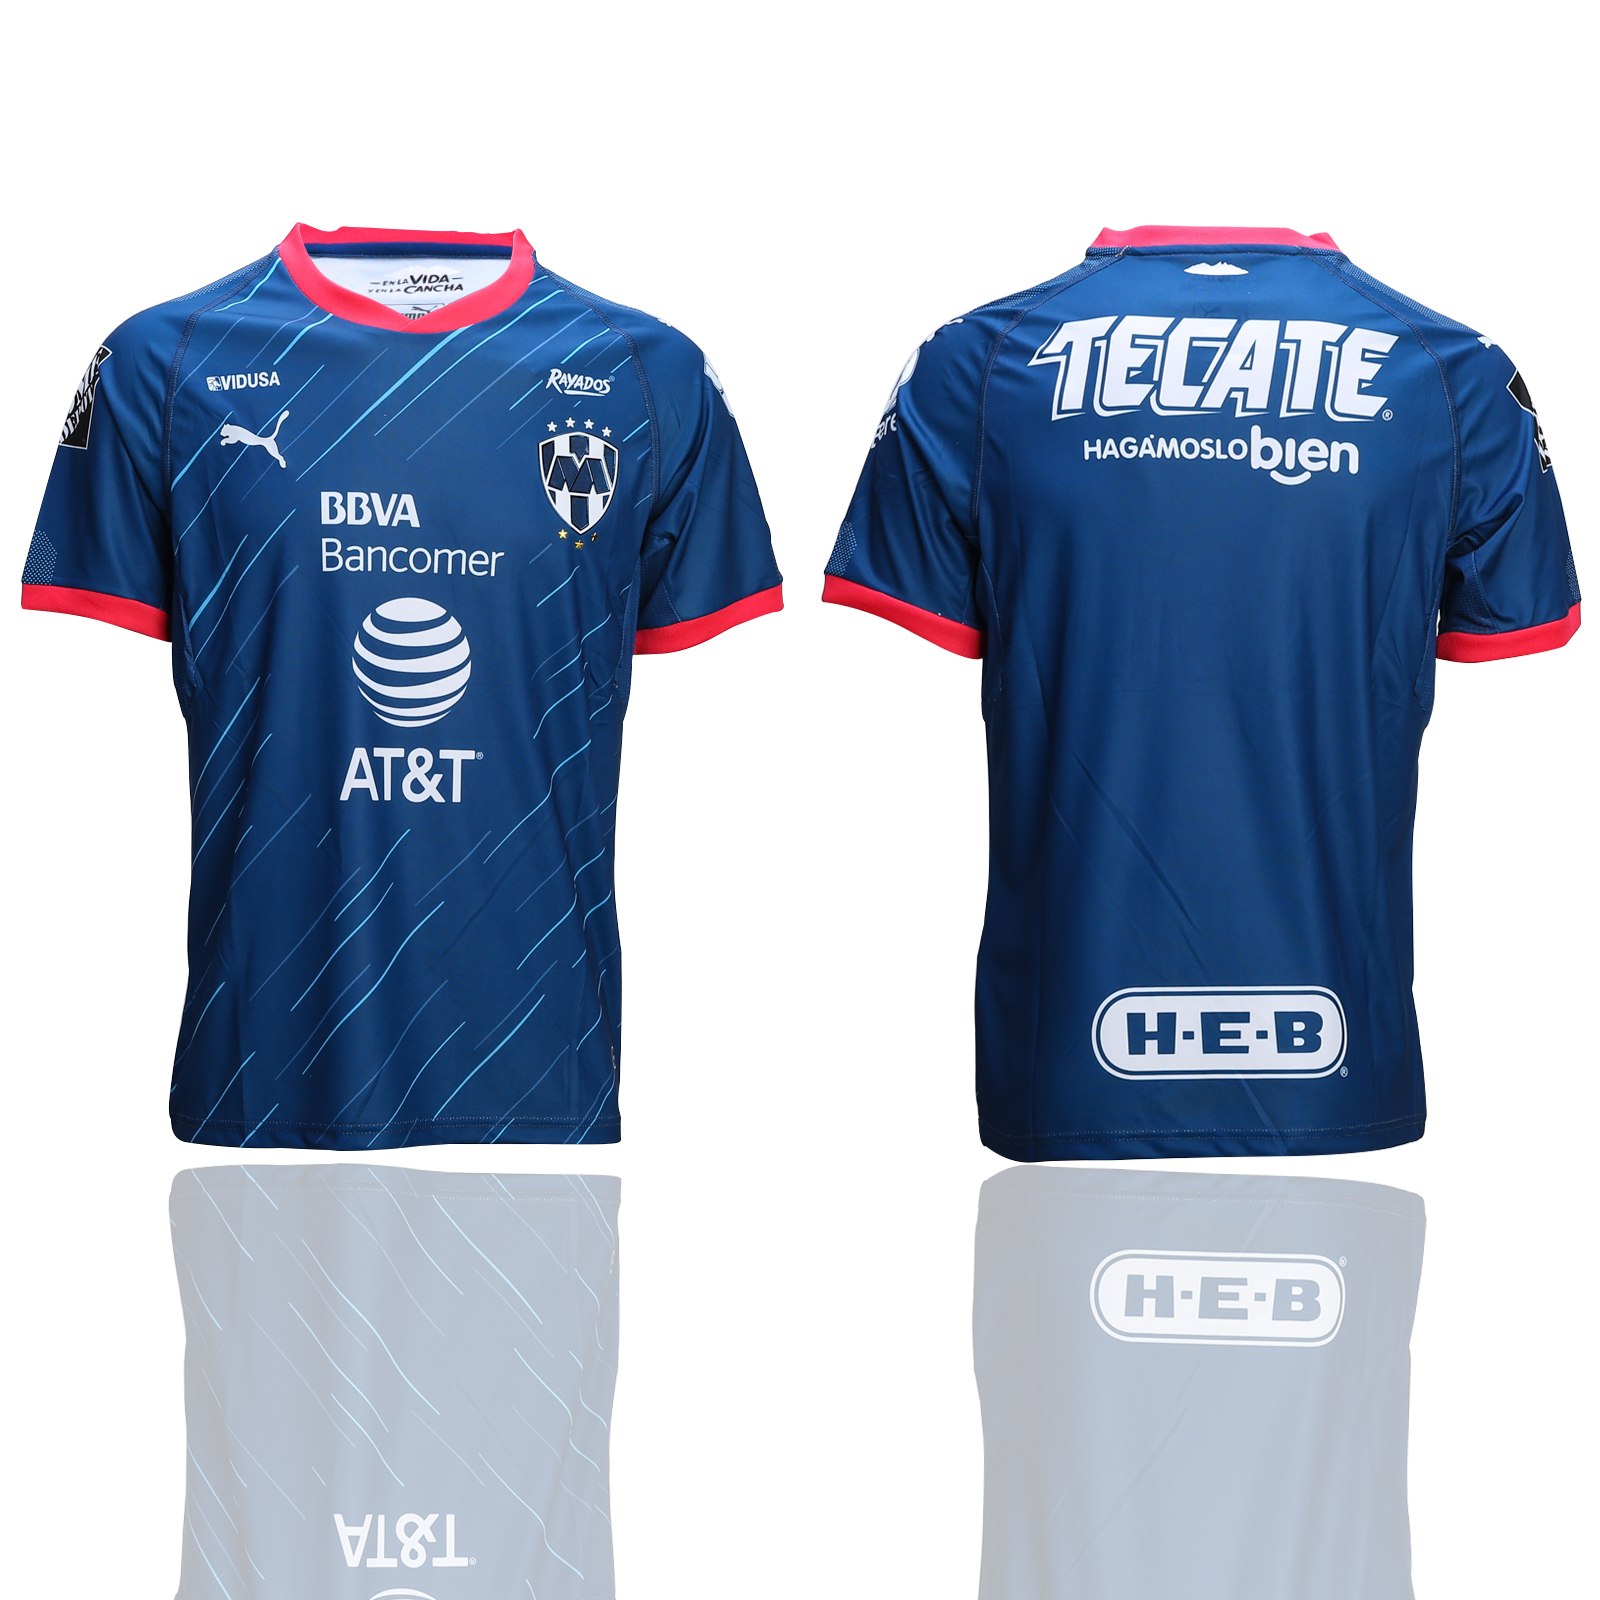 2018-19 Monterey Away Thailand Soccer Jersey